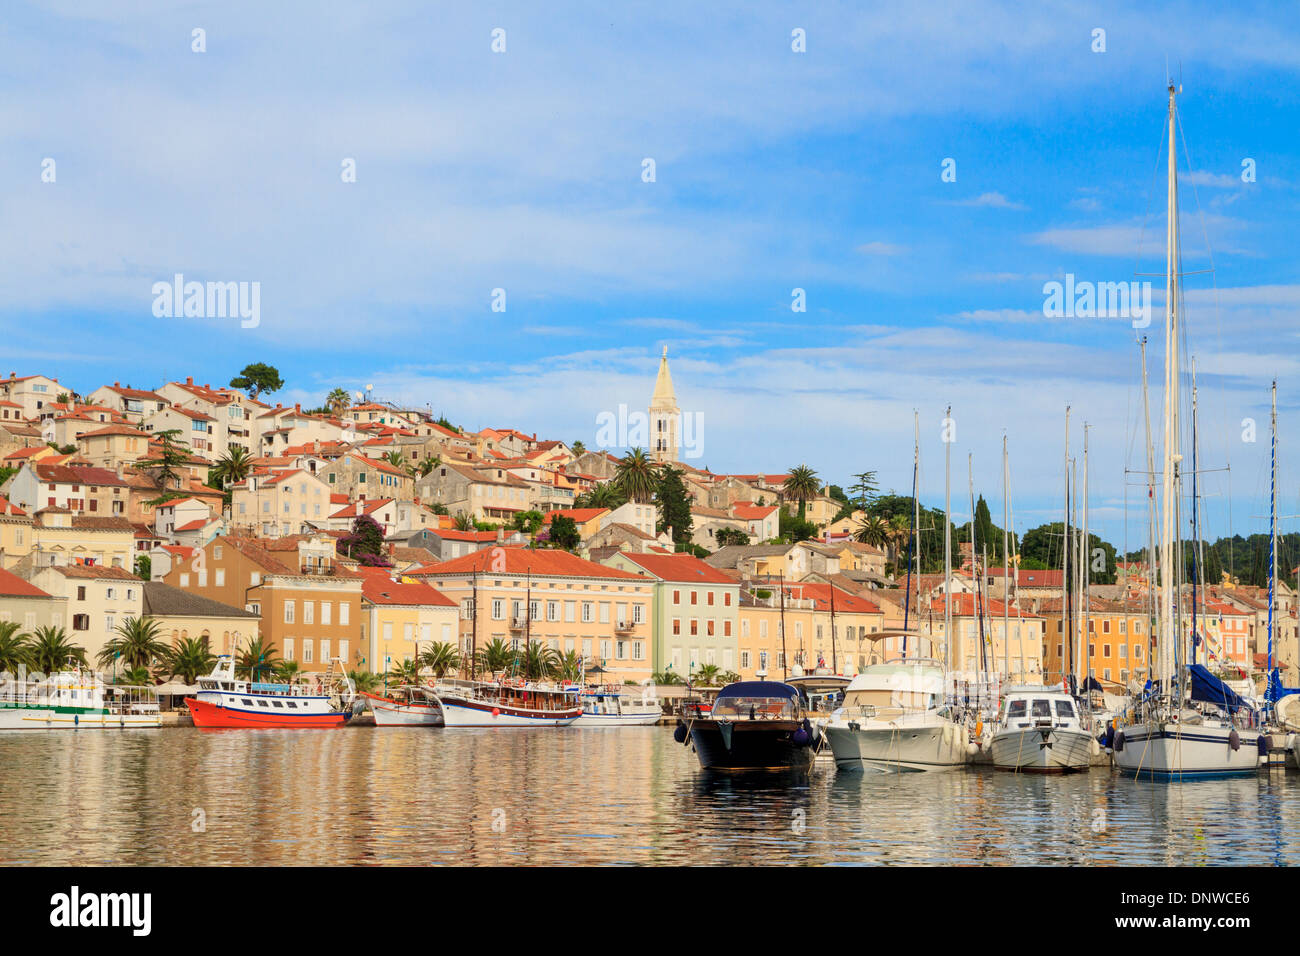 Mali Losinj Waterfront und Hafen, Insel Losinj, Dalmatien, Kroatien Stockbild